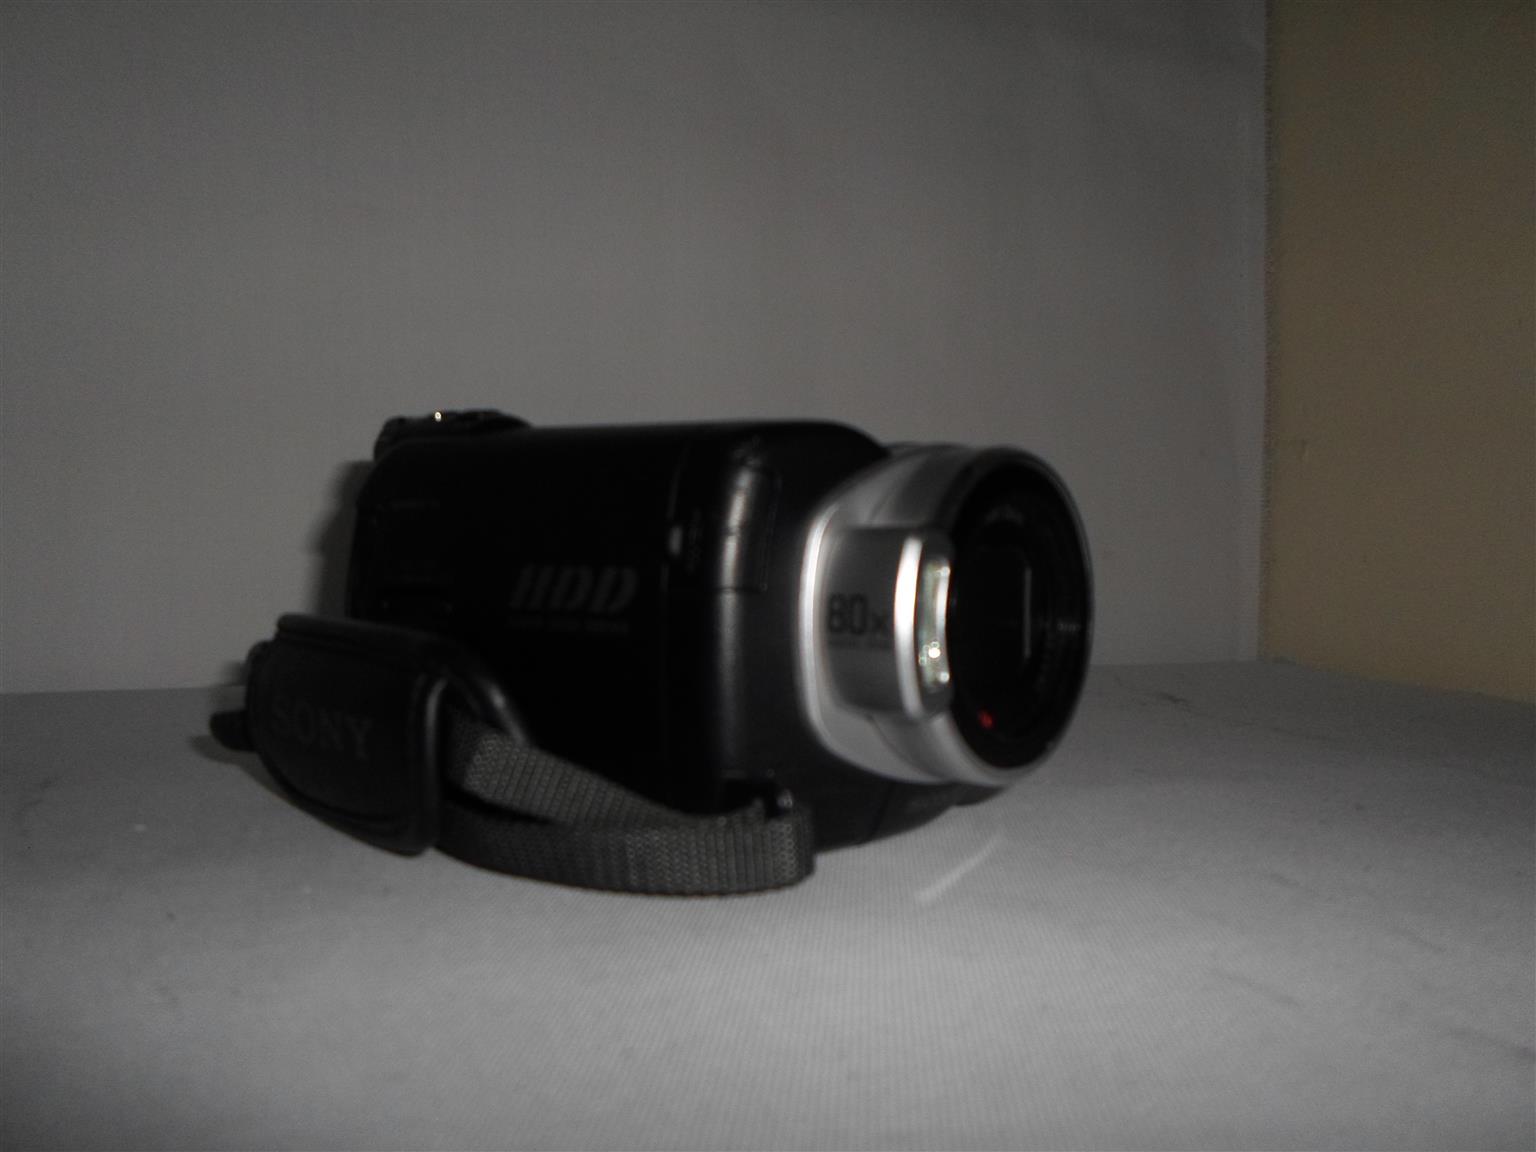 Sony Handycam Video Camer